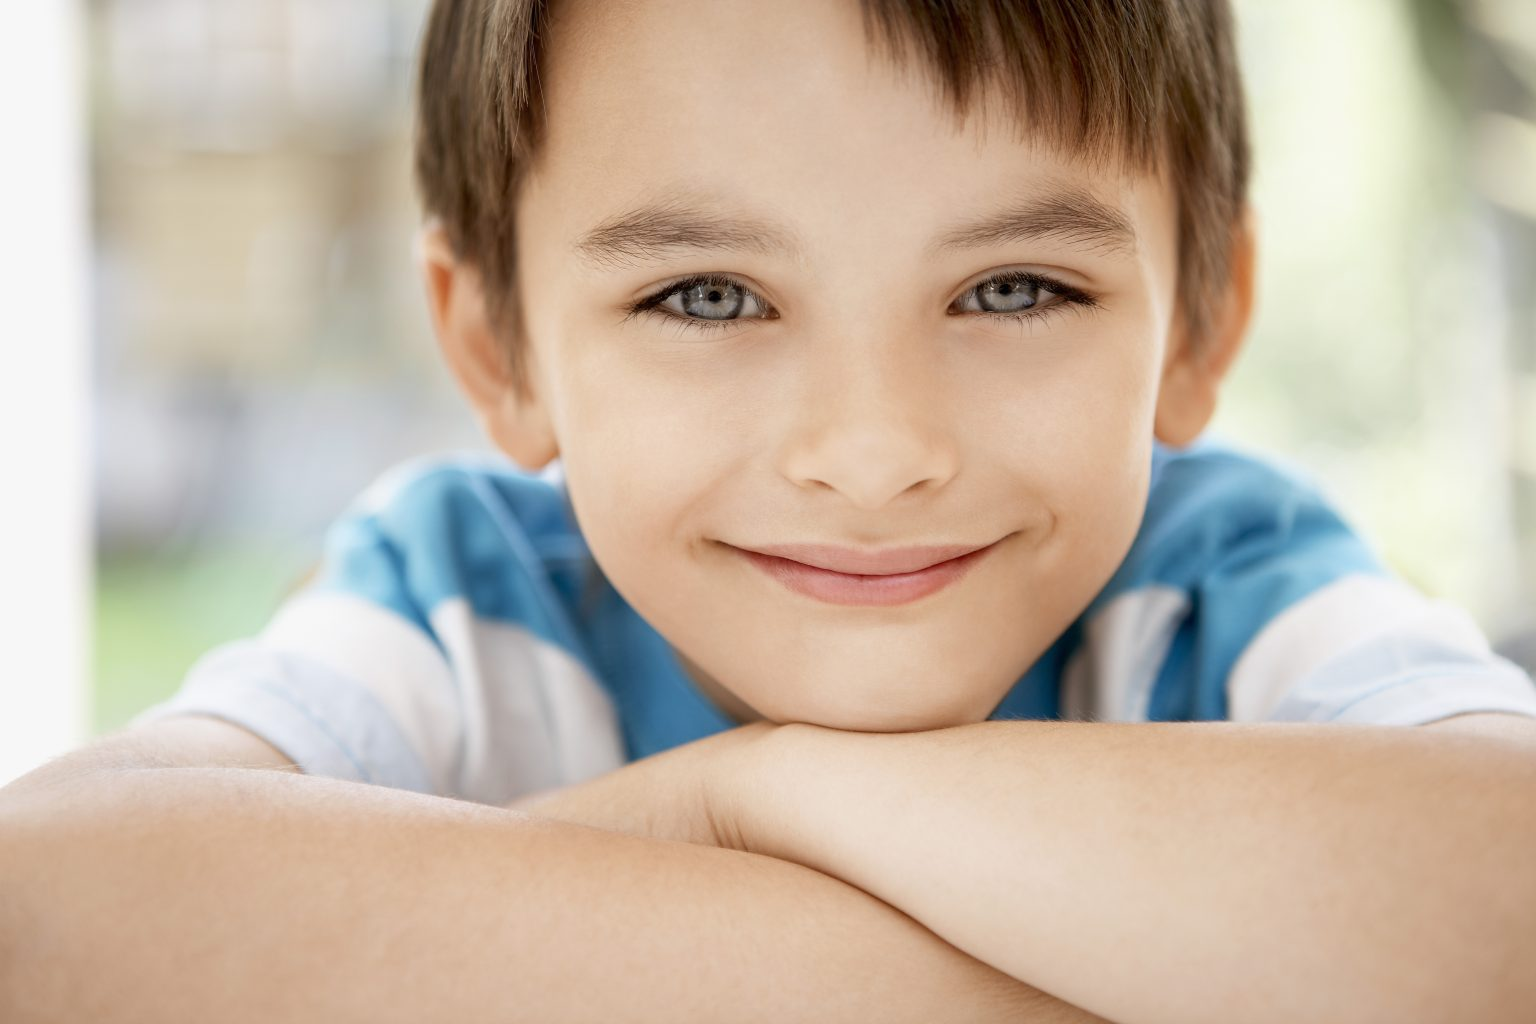 Autism Spectrum Disorders (PDD, Aspergers, etc.)